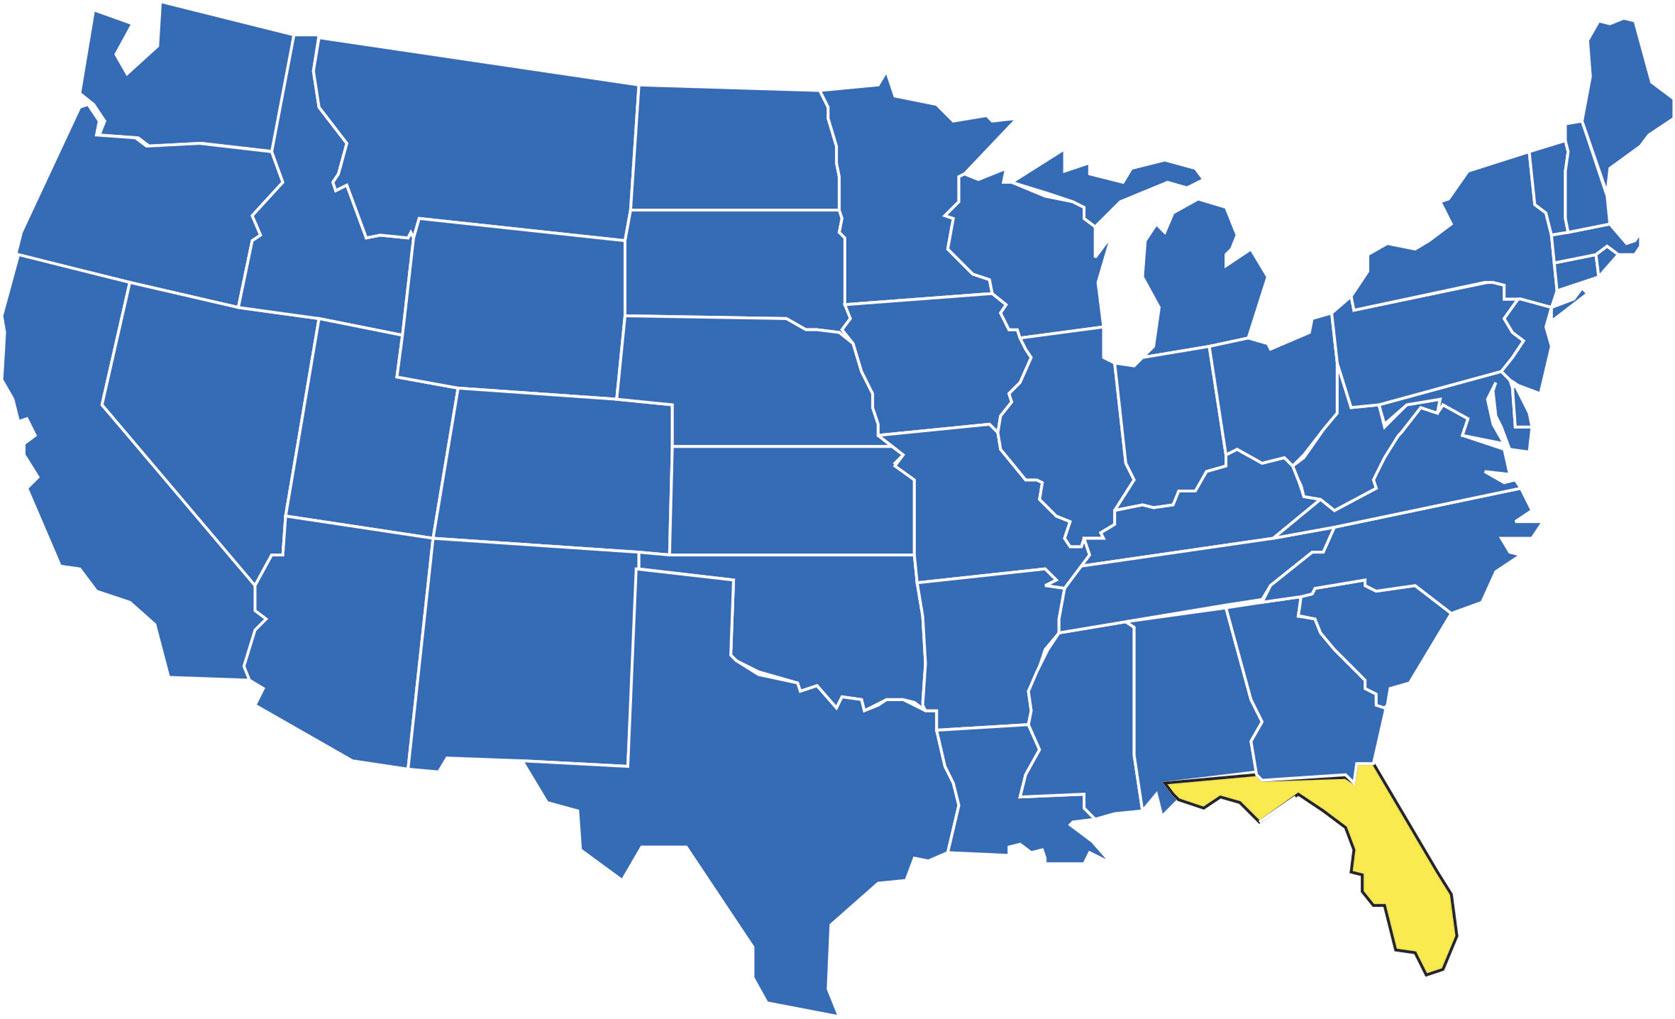 Florida Location Map.Florida Location Map